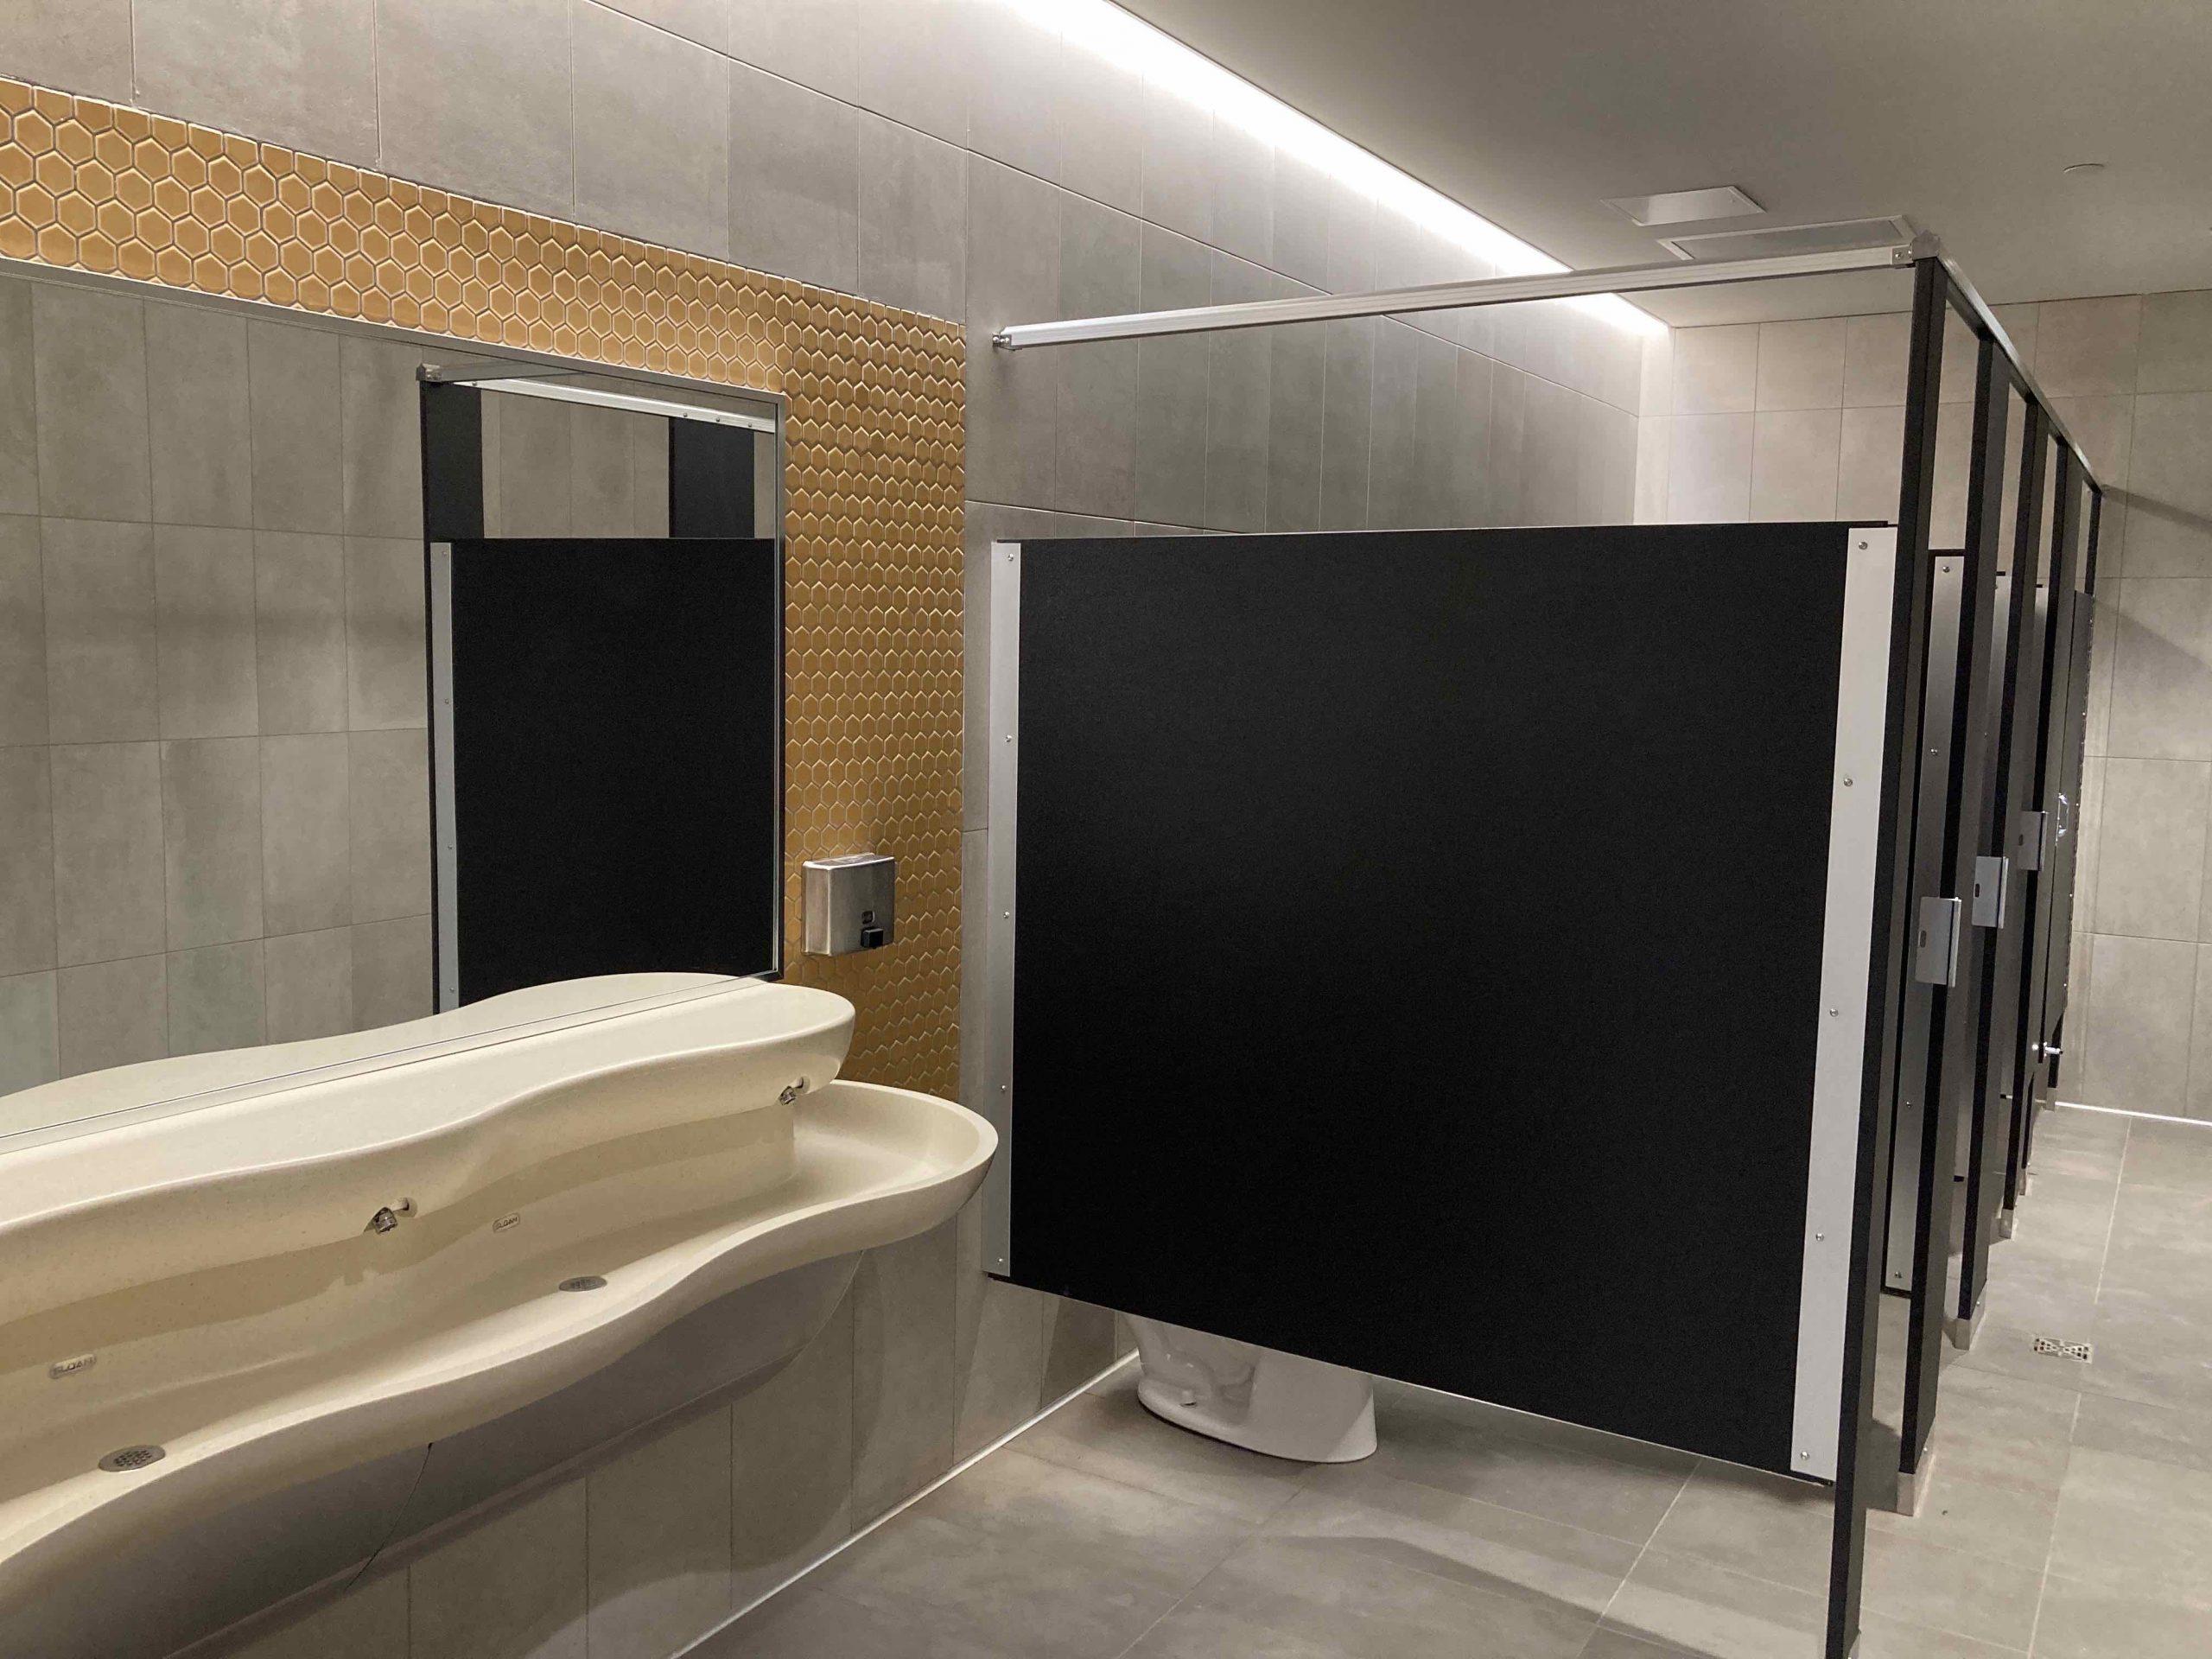 Restrooms Complete image 0